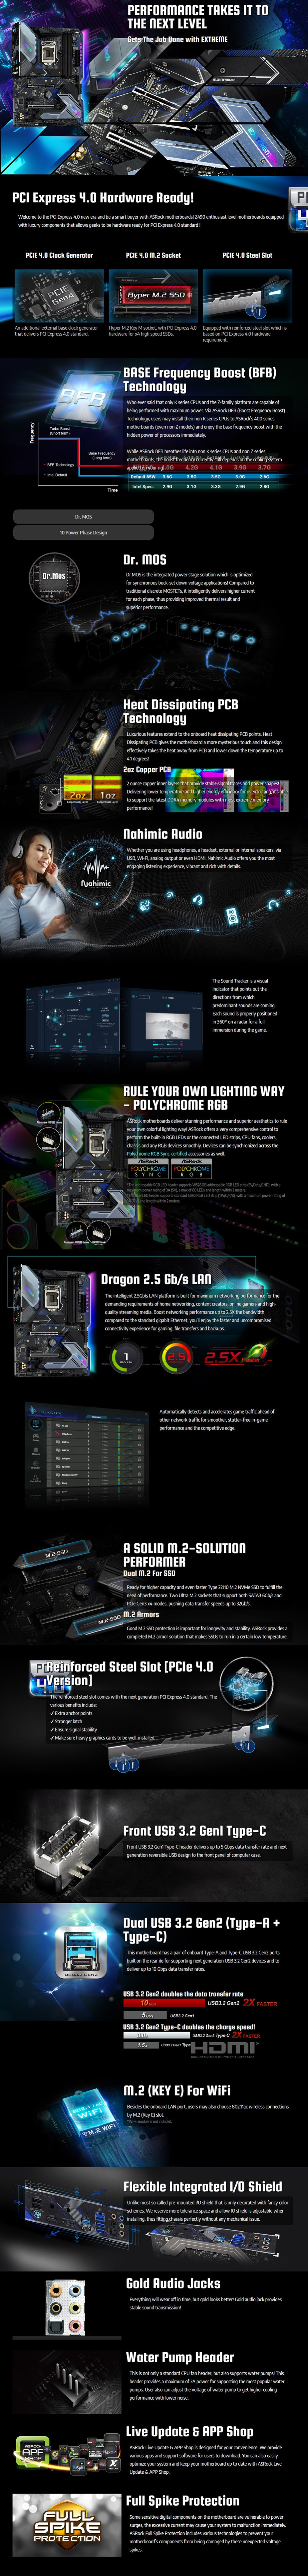 asrock-z490-extreme4-lga-1200-atx-motherboard-ac34583-8.jpg